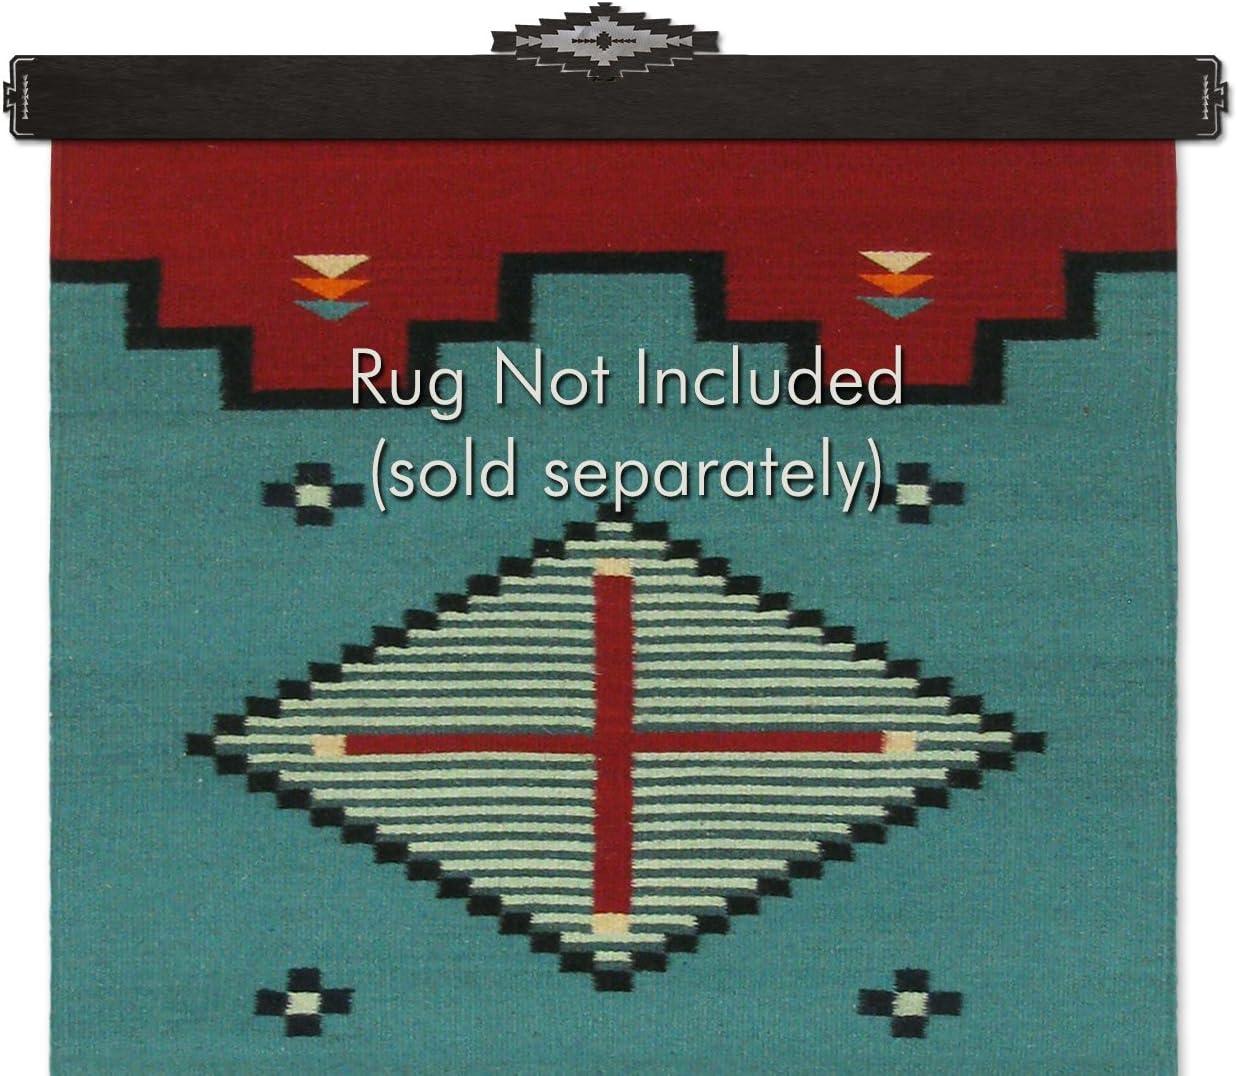 Sunland Artisans Southwest Diamond Metal Rug Hanger - Blackened Iron (42in)